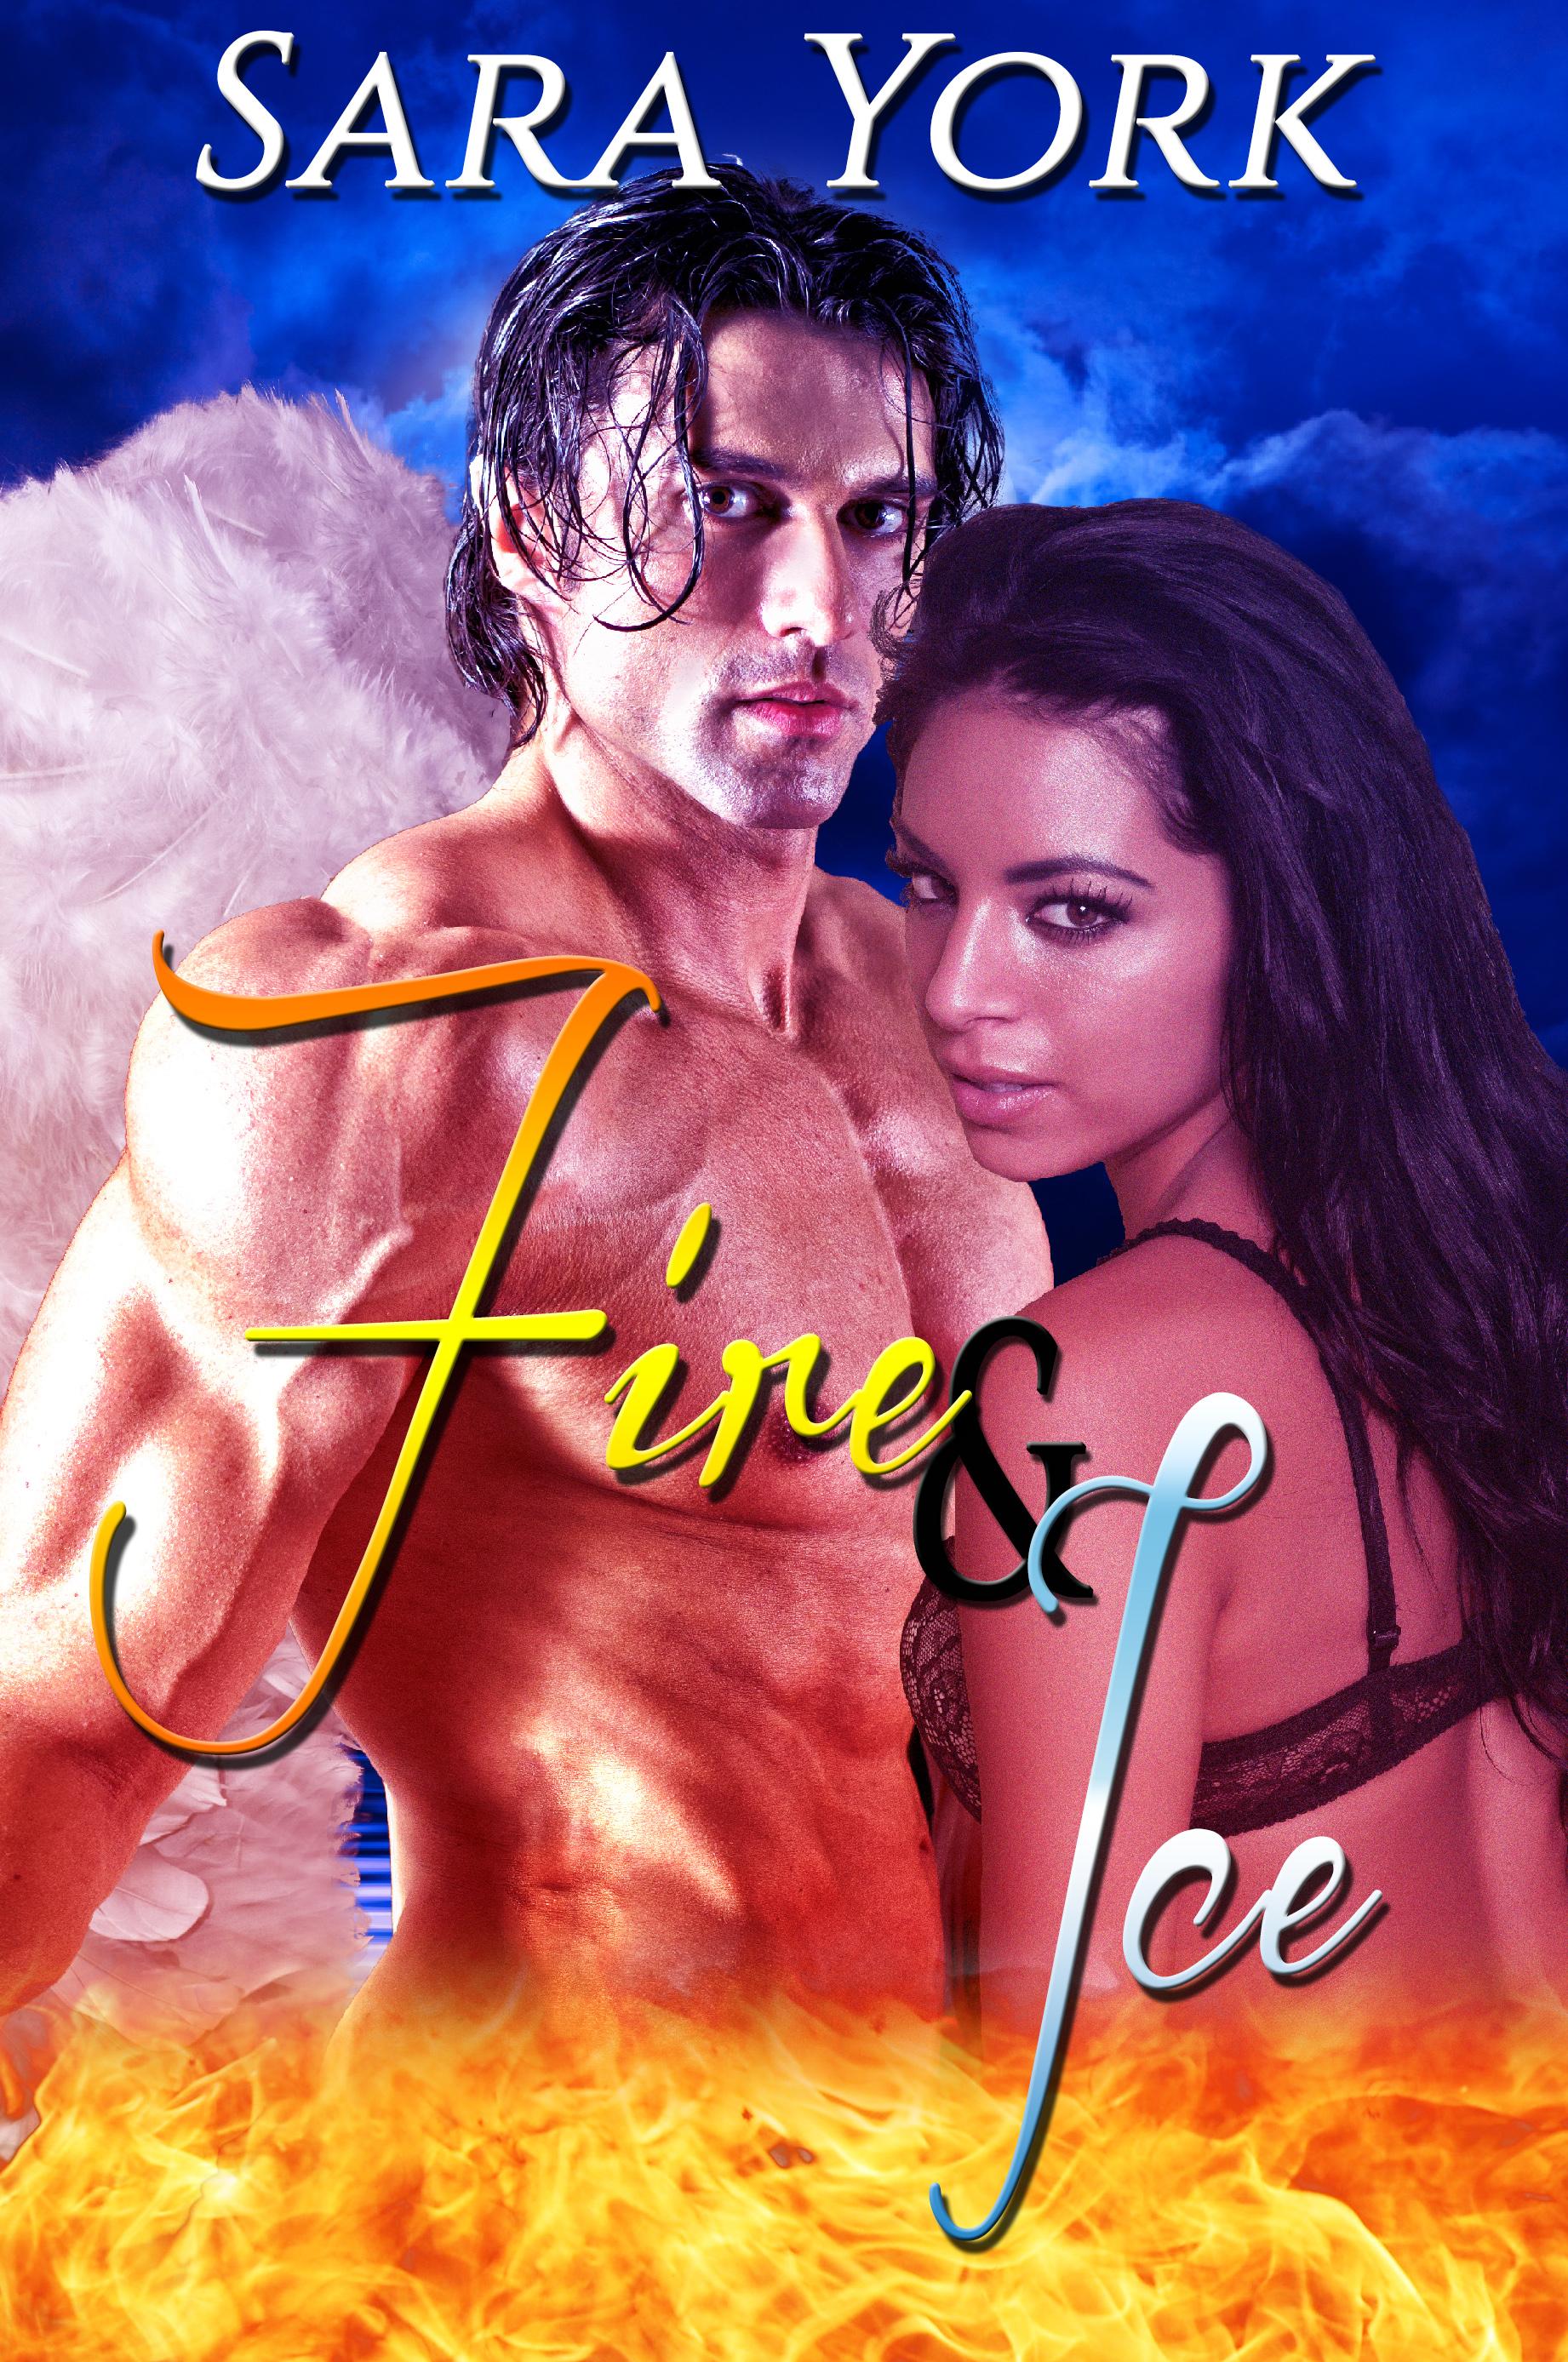 Sara York - Fire and Ice